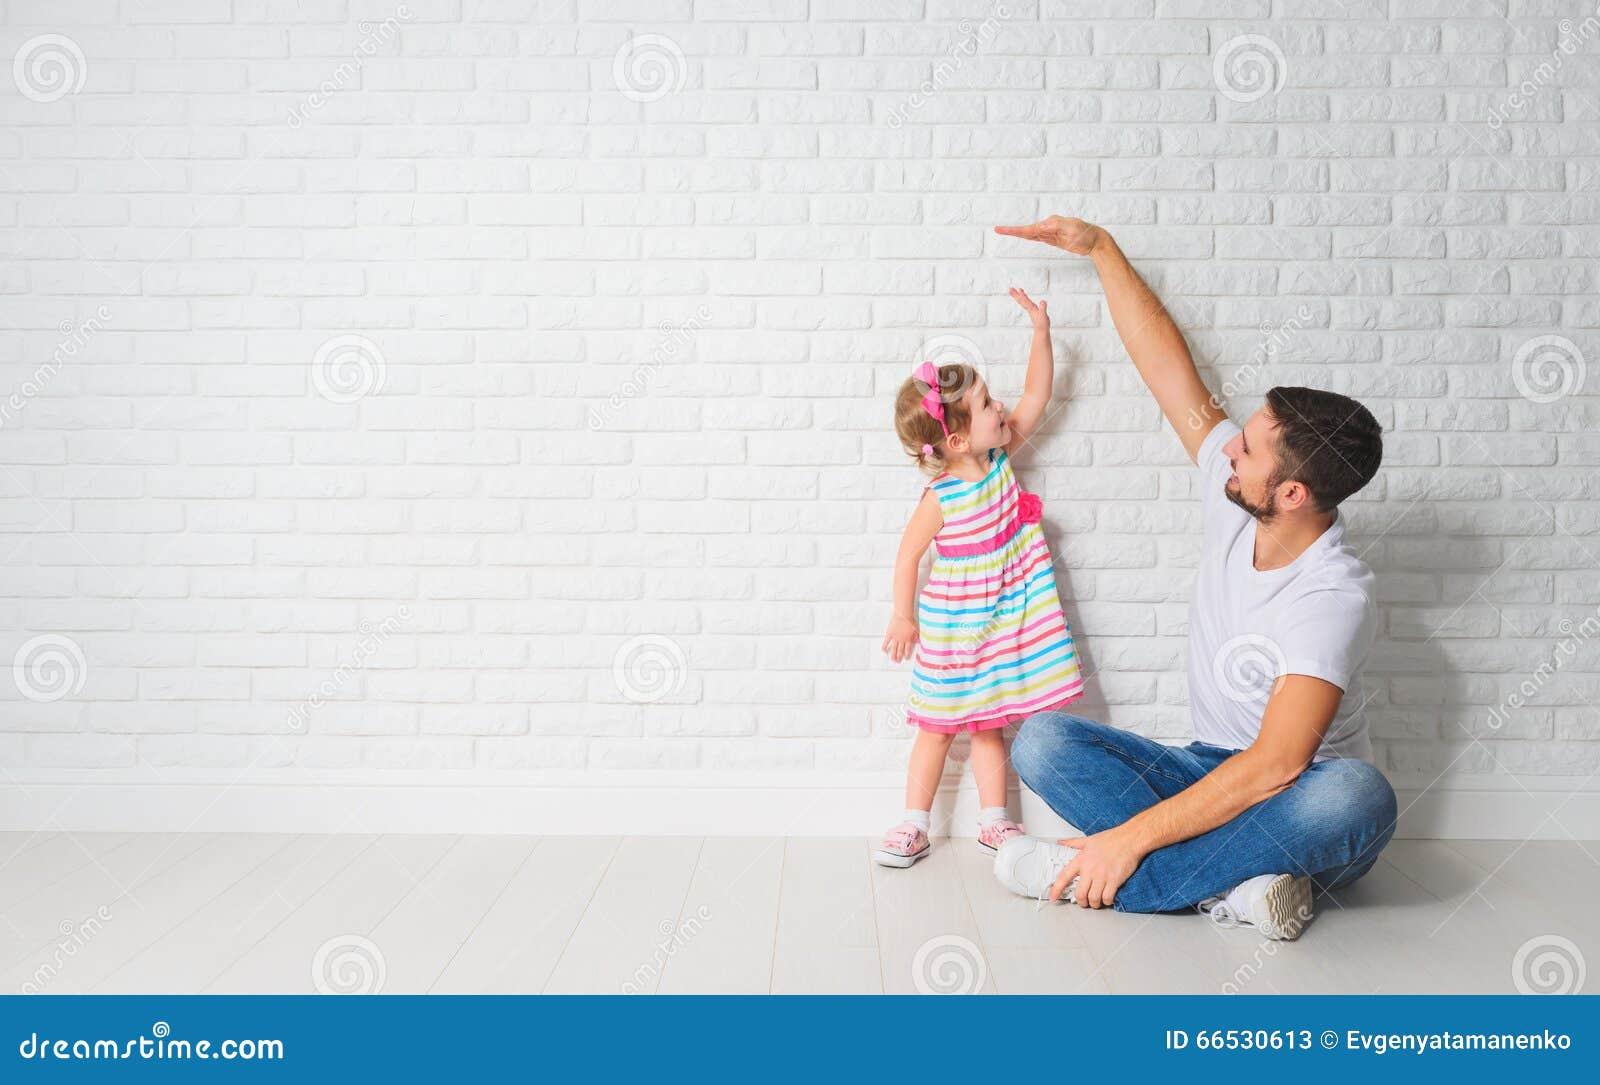 Концепция Папа измеряет рост ее дочери ребенка на стене